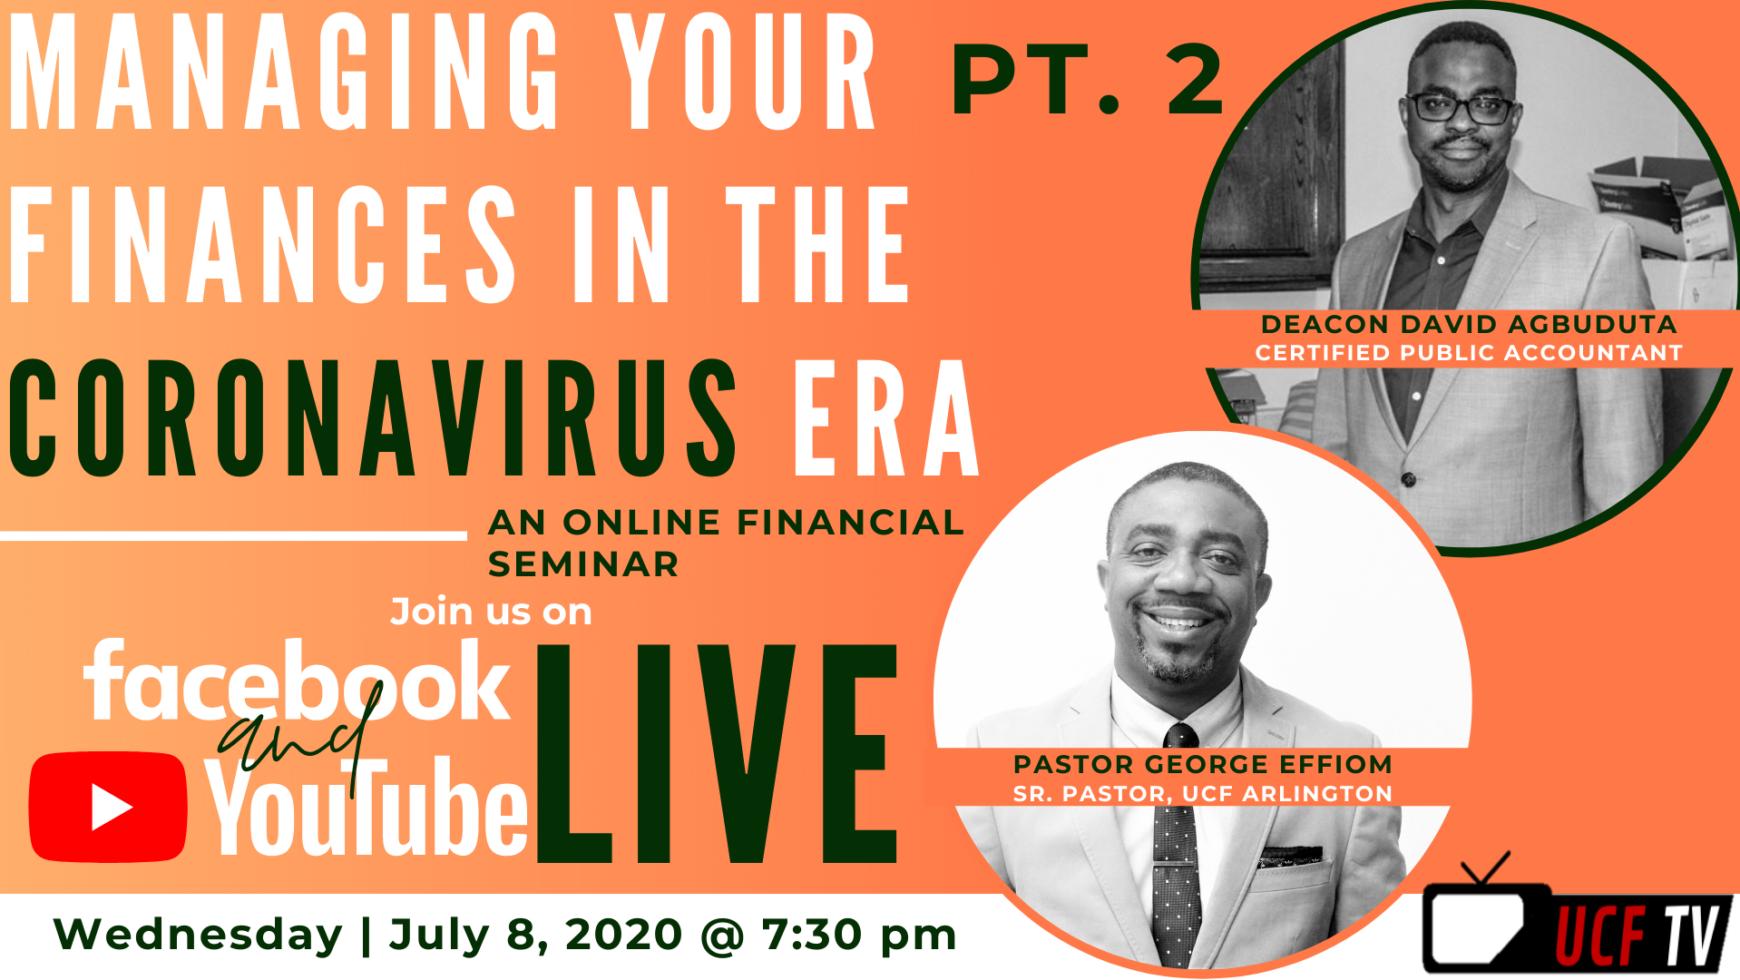 UCF TV- Ep. 3 | Managing Your Finances in the Coronavirus Era (Pt. 2)